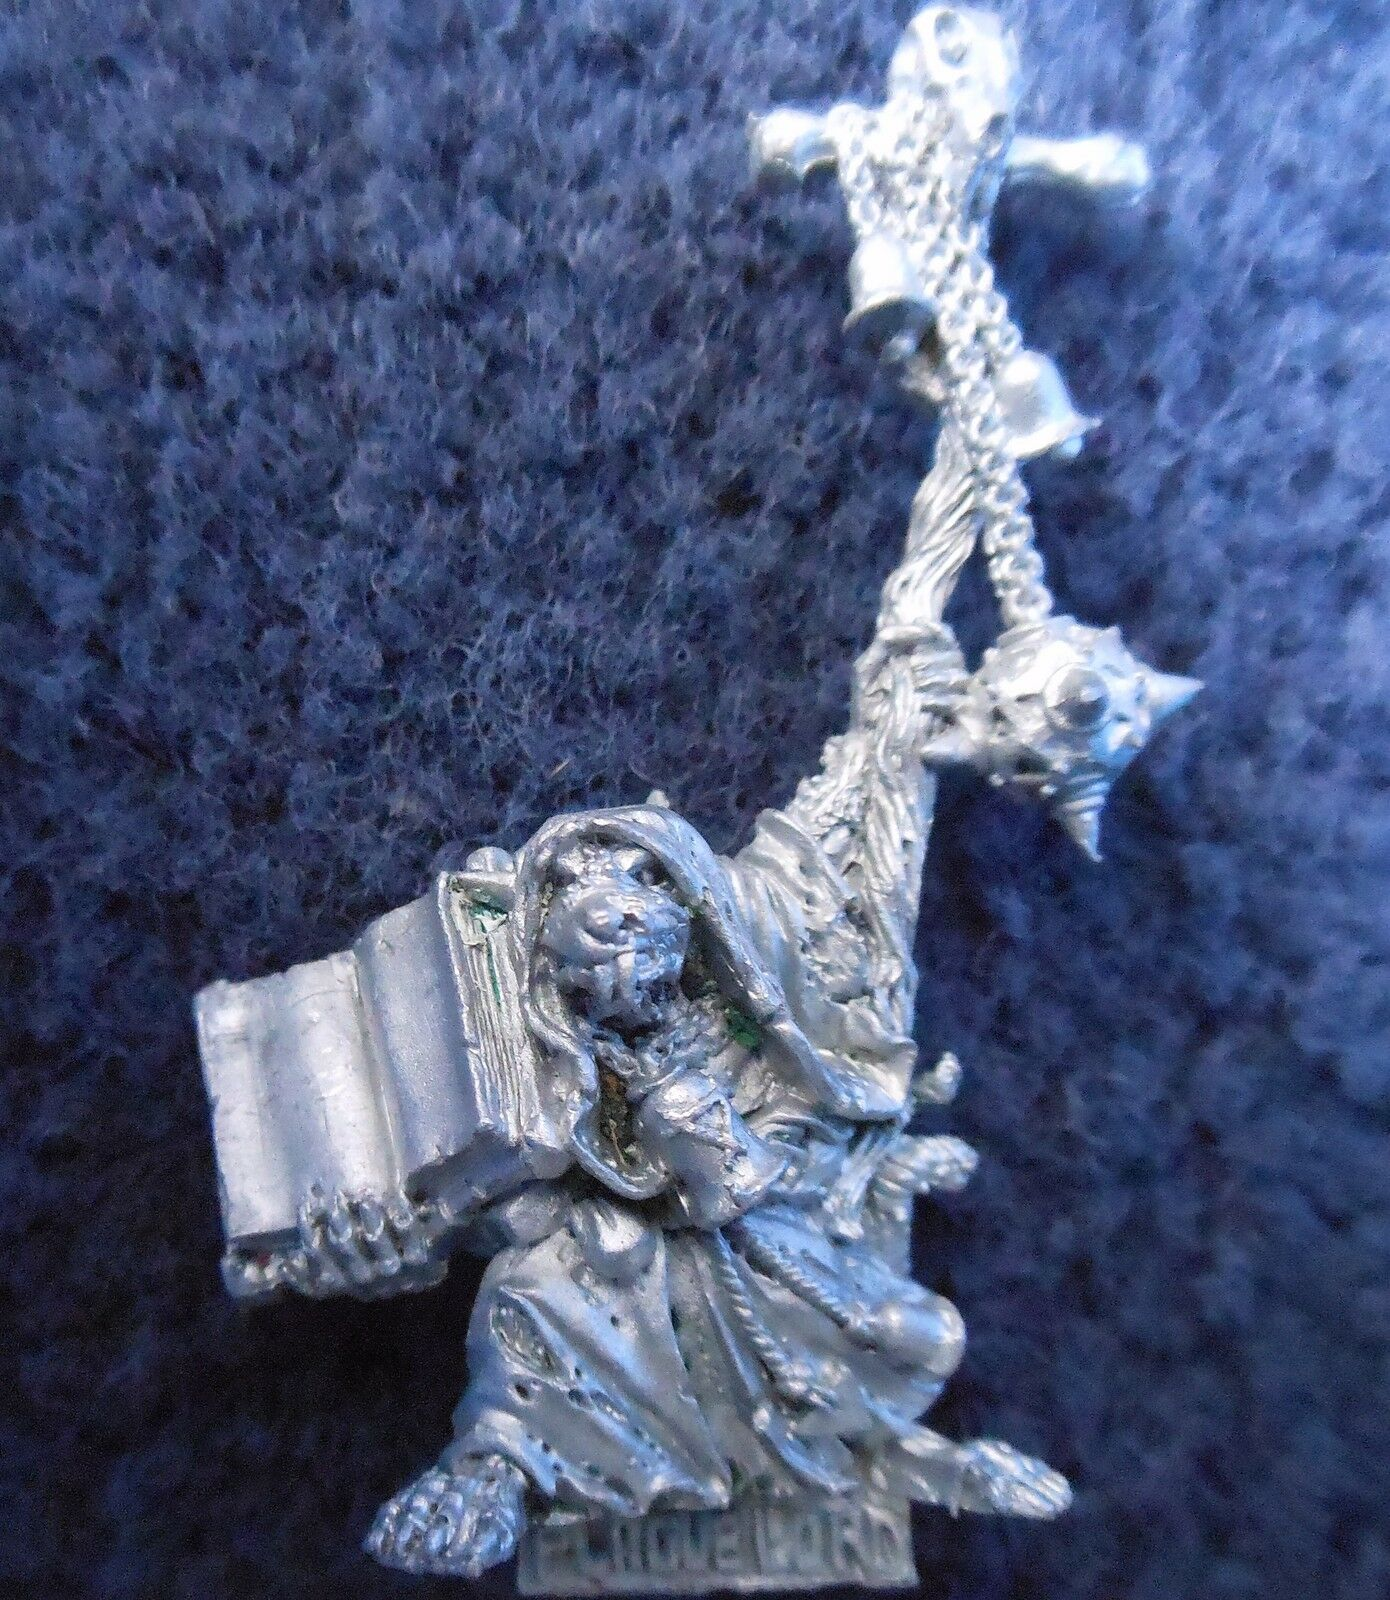 1993 Skaven Lord Skrolk Chaos Ratmen Citadel Command Warhammer Plaguelord Plaguelord Plaguelord Priest 4f2252